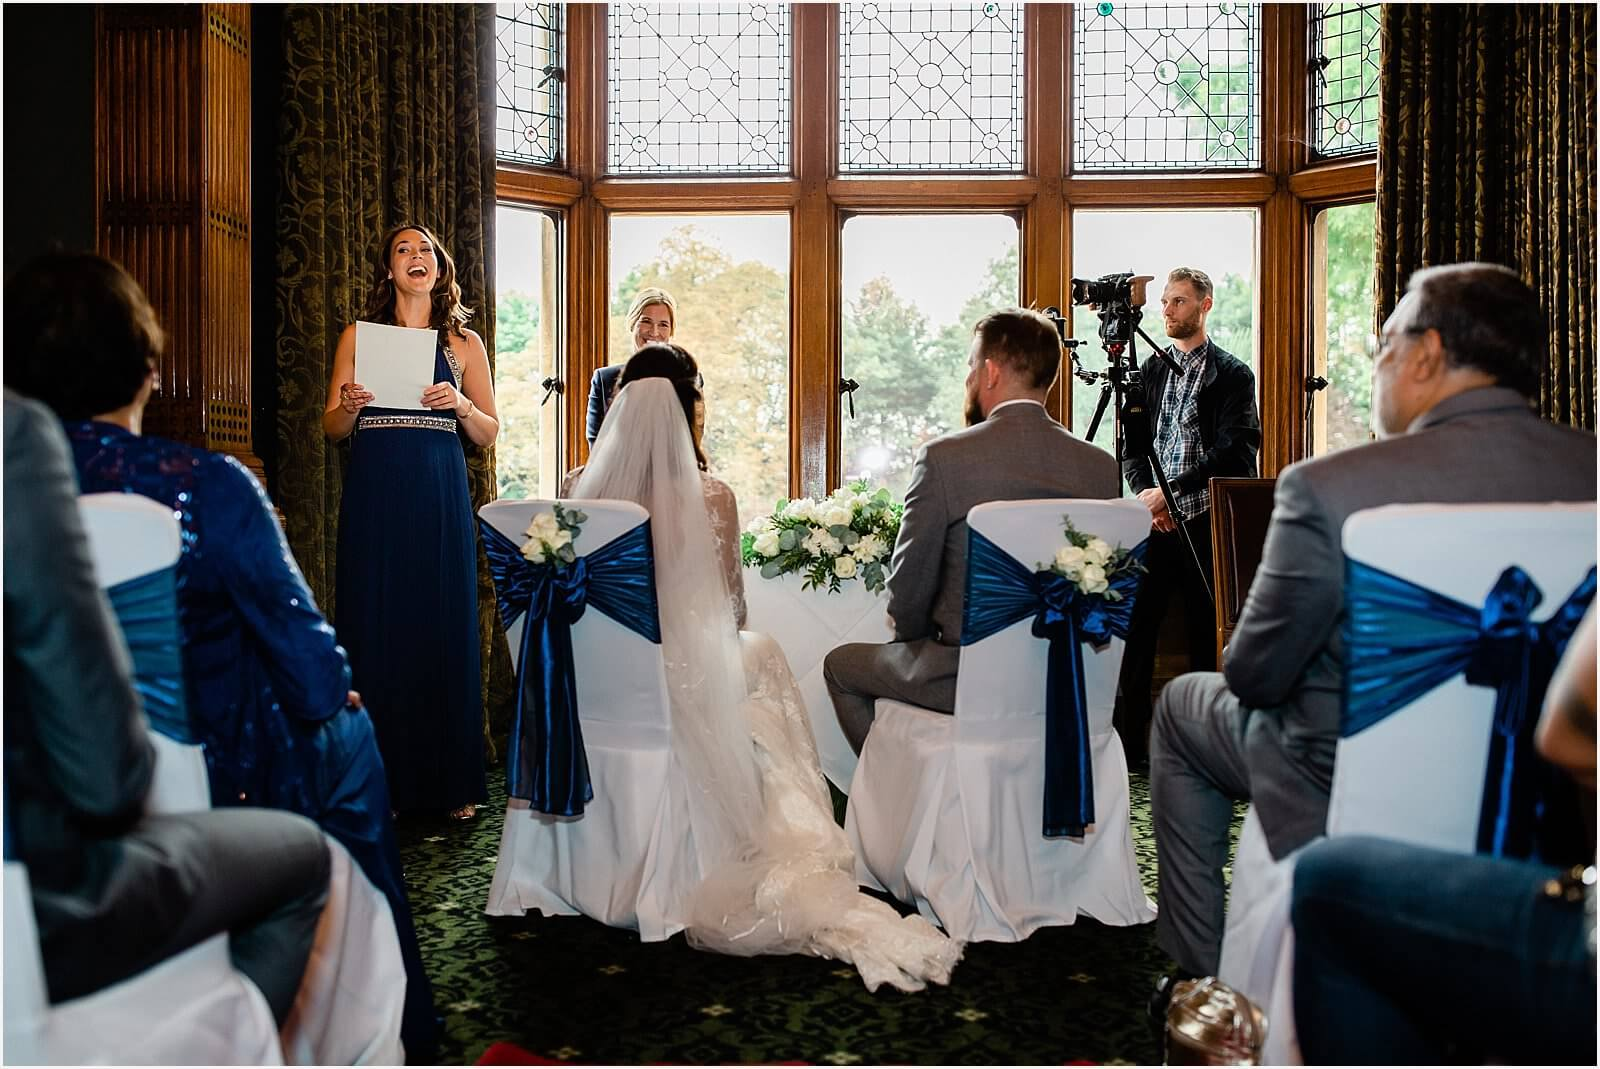 Woodlands Park Hotel Wedding   Anisa & Tristan 22